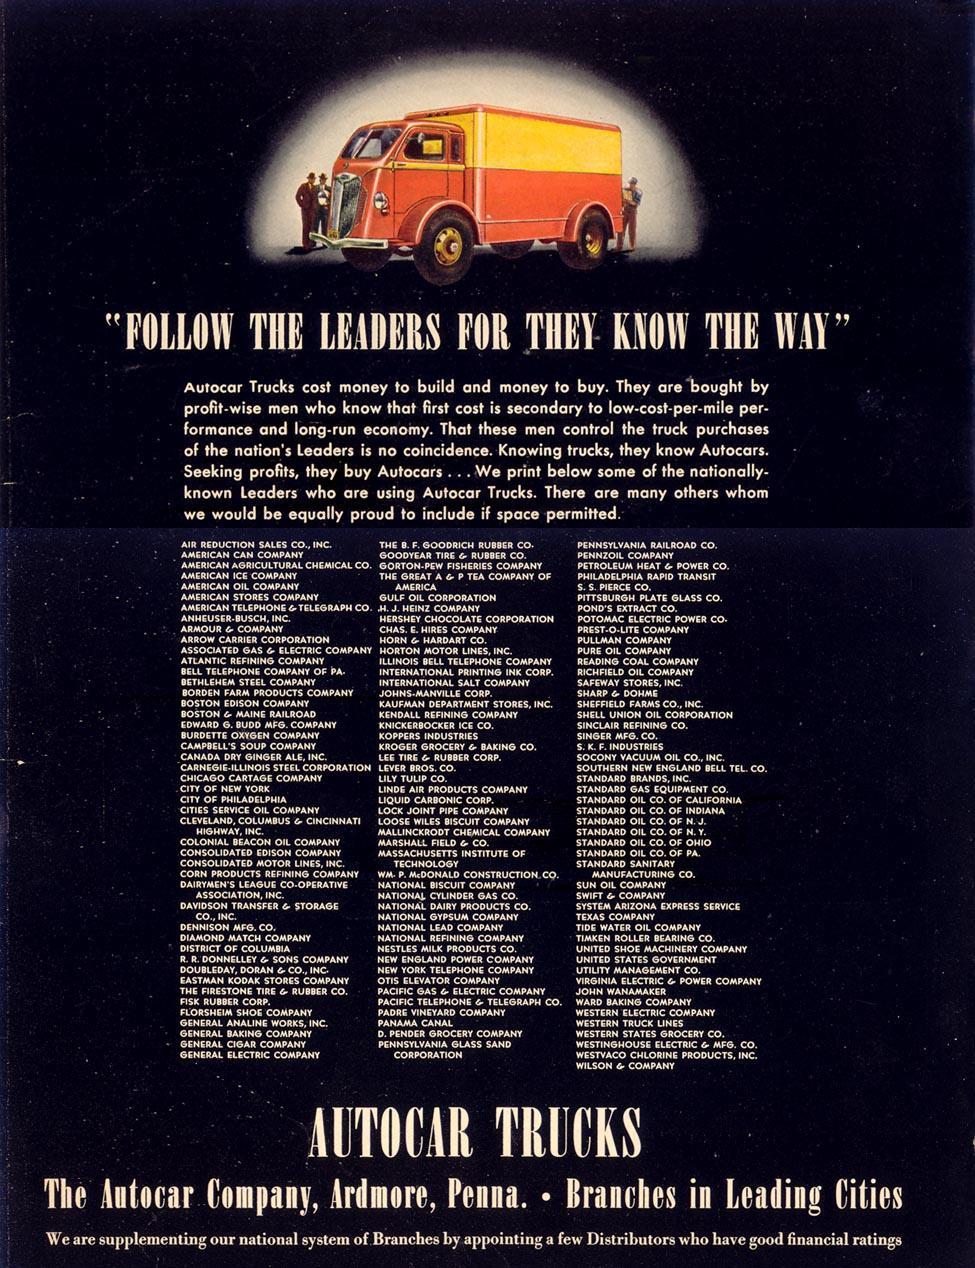 AUTOCAR TRUCKS LIFE 09/27/1937